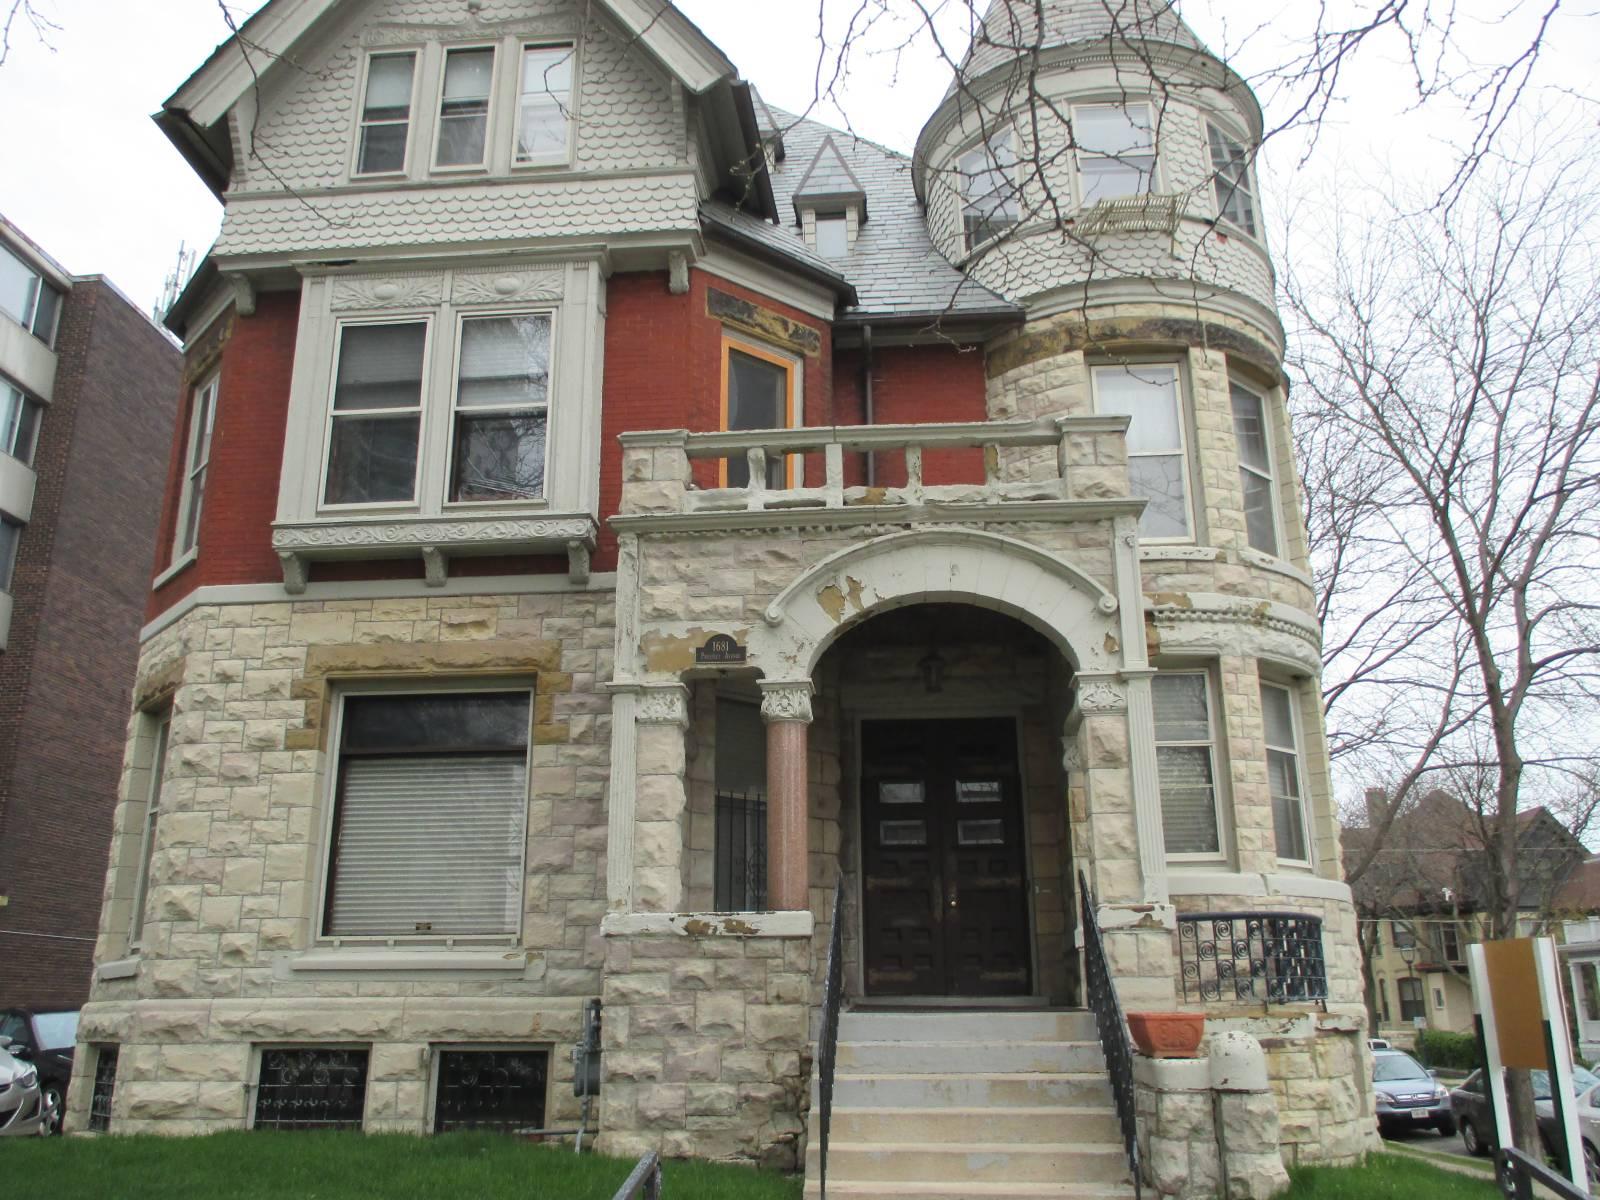 Adler House, 2015. Photo credit: Baldev Sidhu and Urban Milwaukee